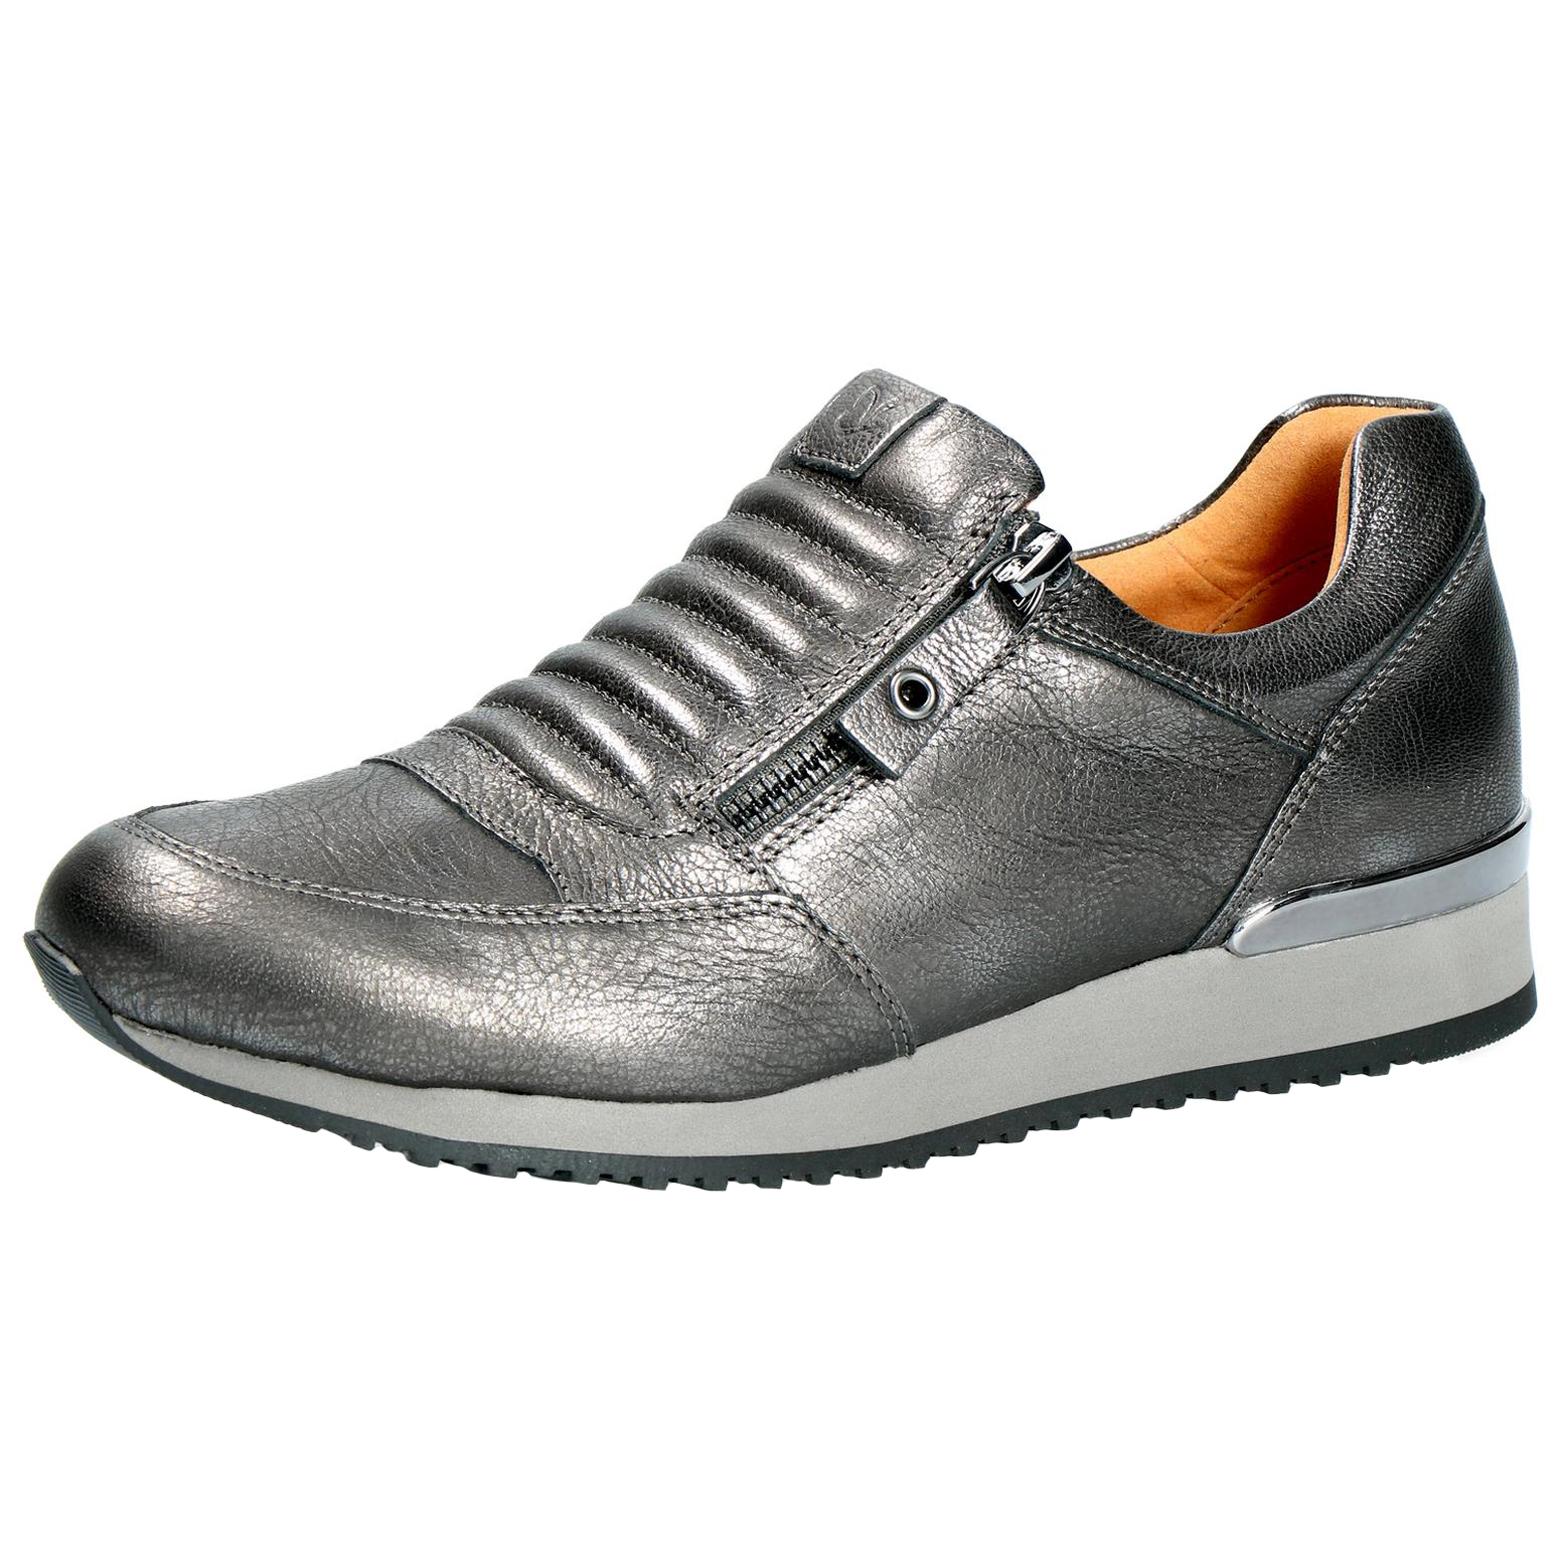 Caprice Damen Slipper 9-24605-21-202 dunkelgrau metallic Damenschuhe ... 2578c72637